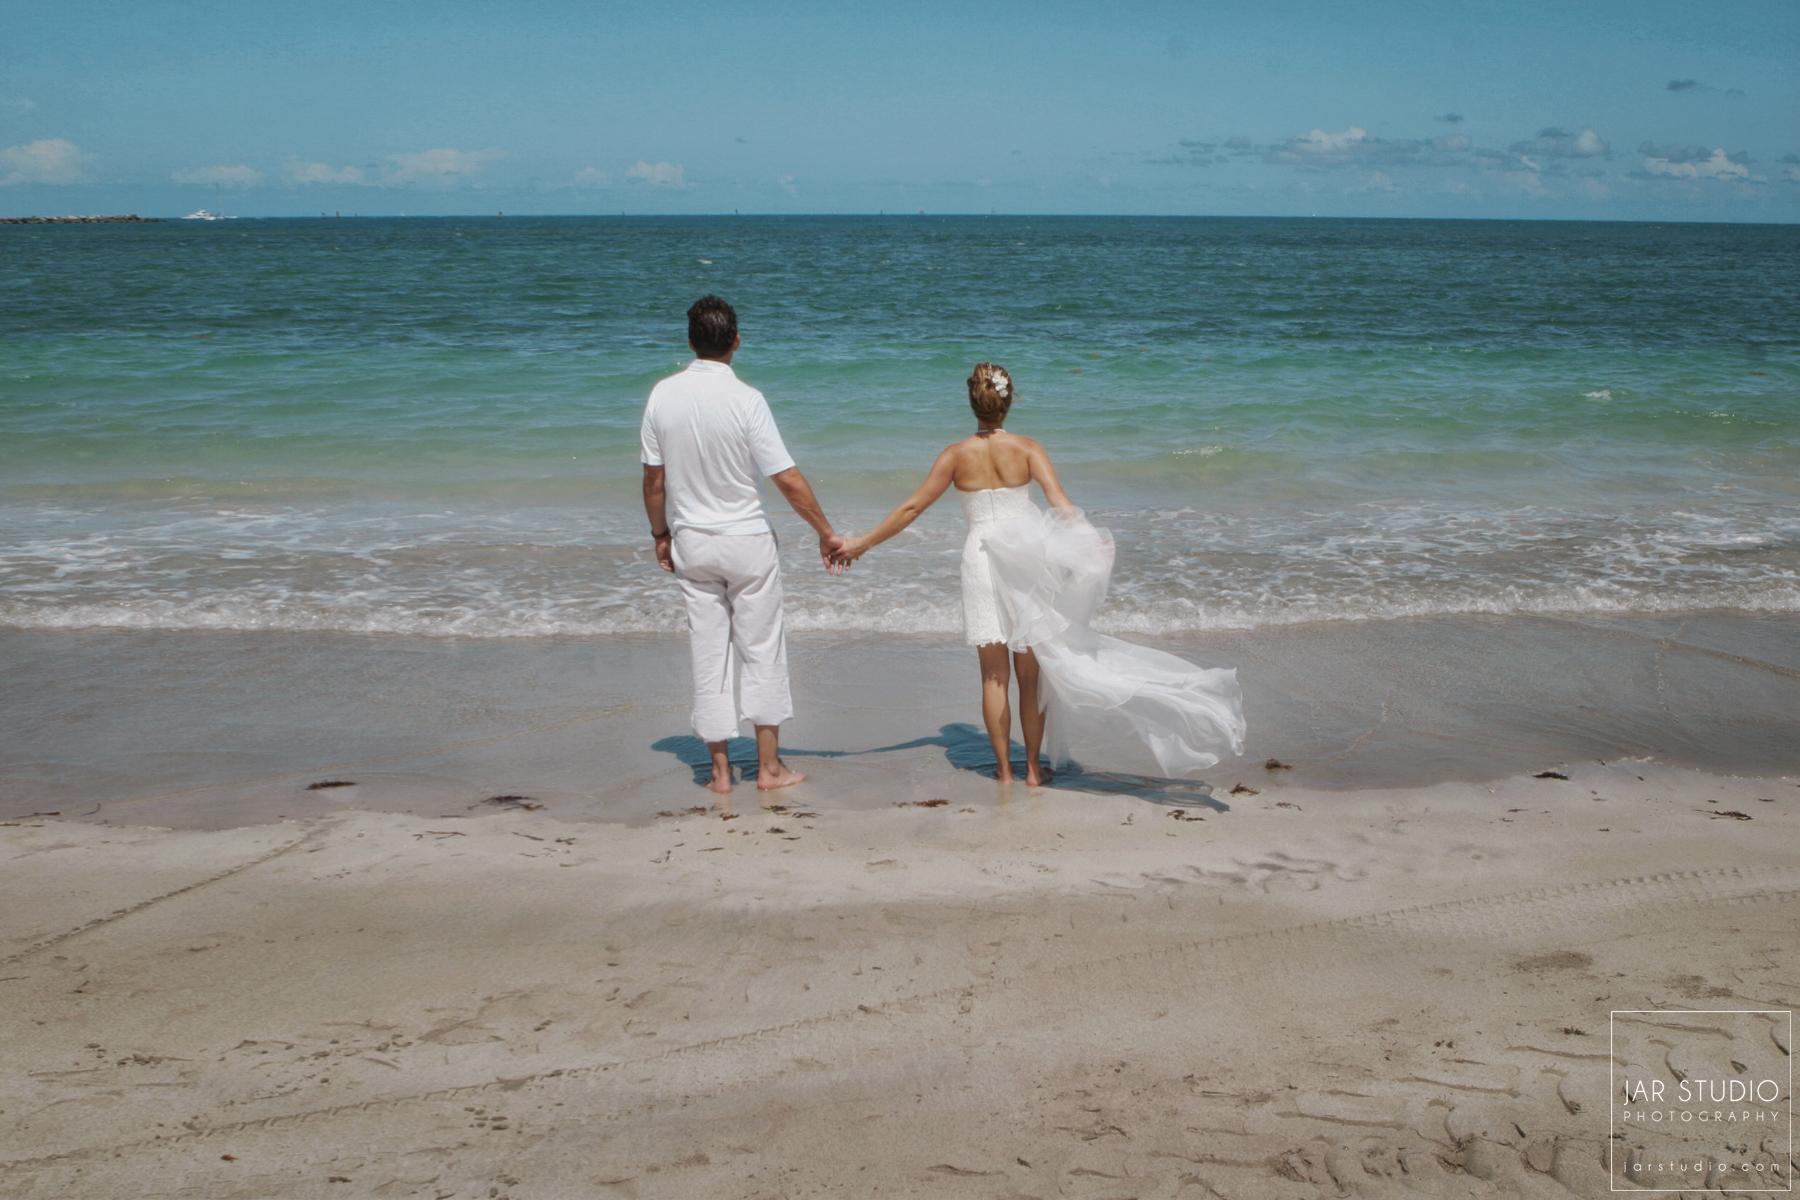 jarstudio-fisherisland-club-wedding-photographer (30).JPG